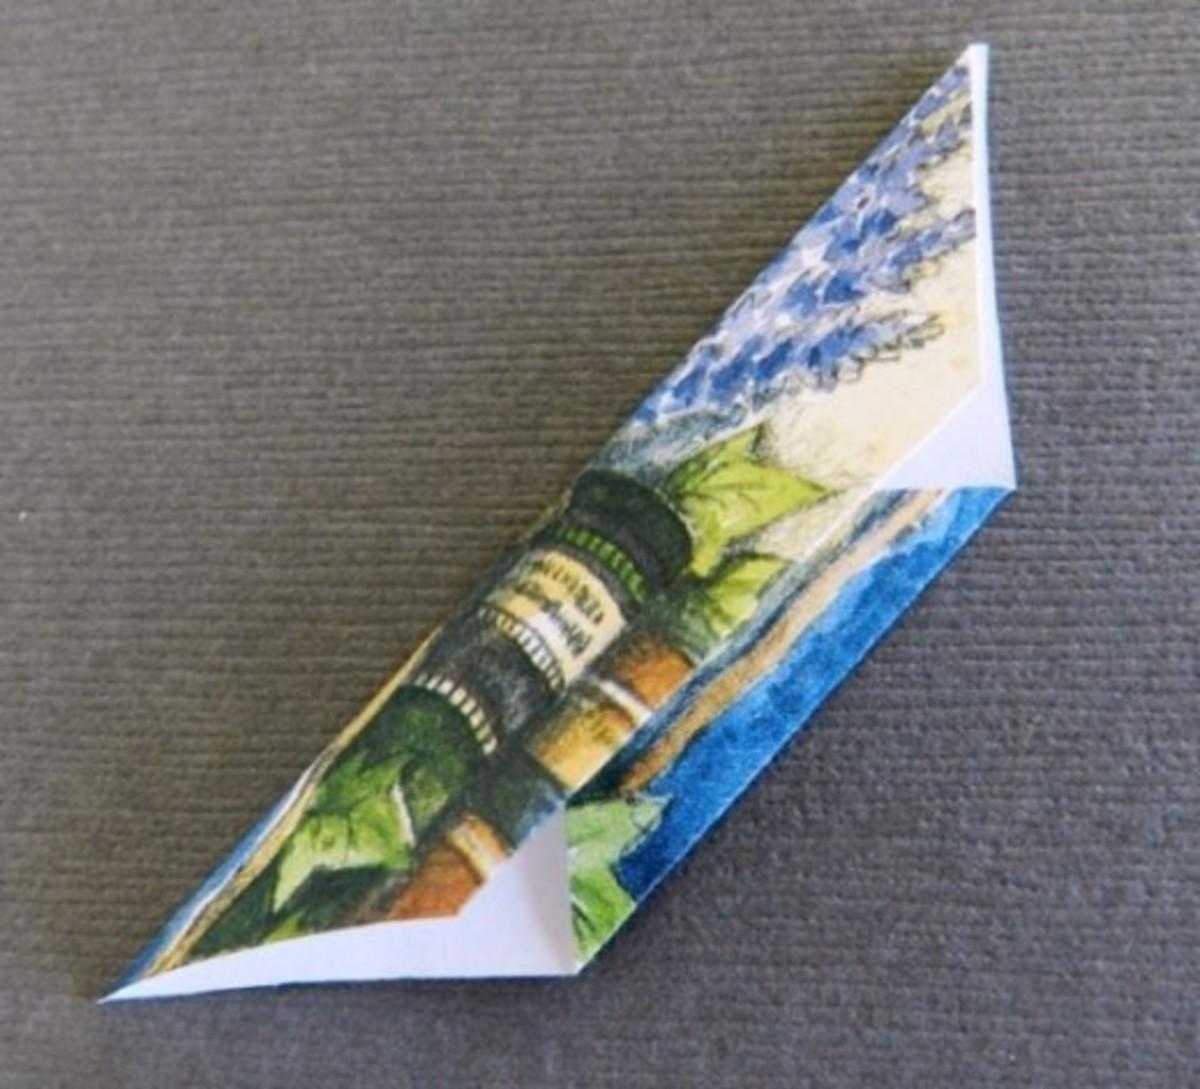 Basis Origami for Tea bag Folding